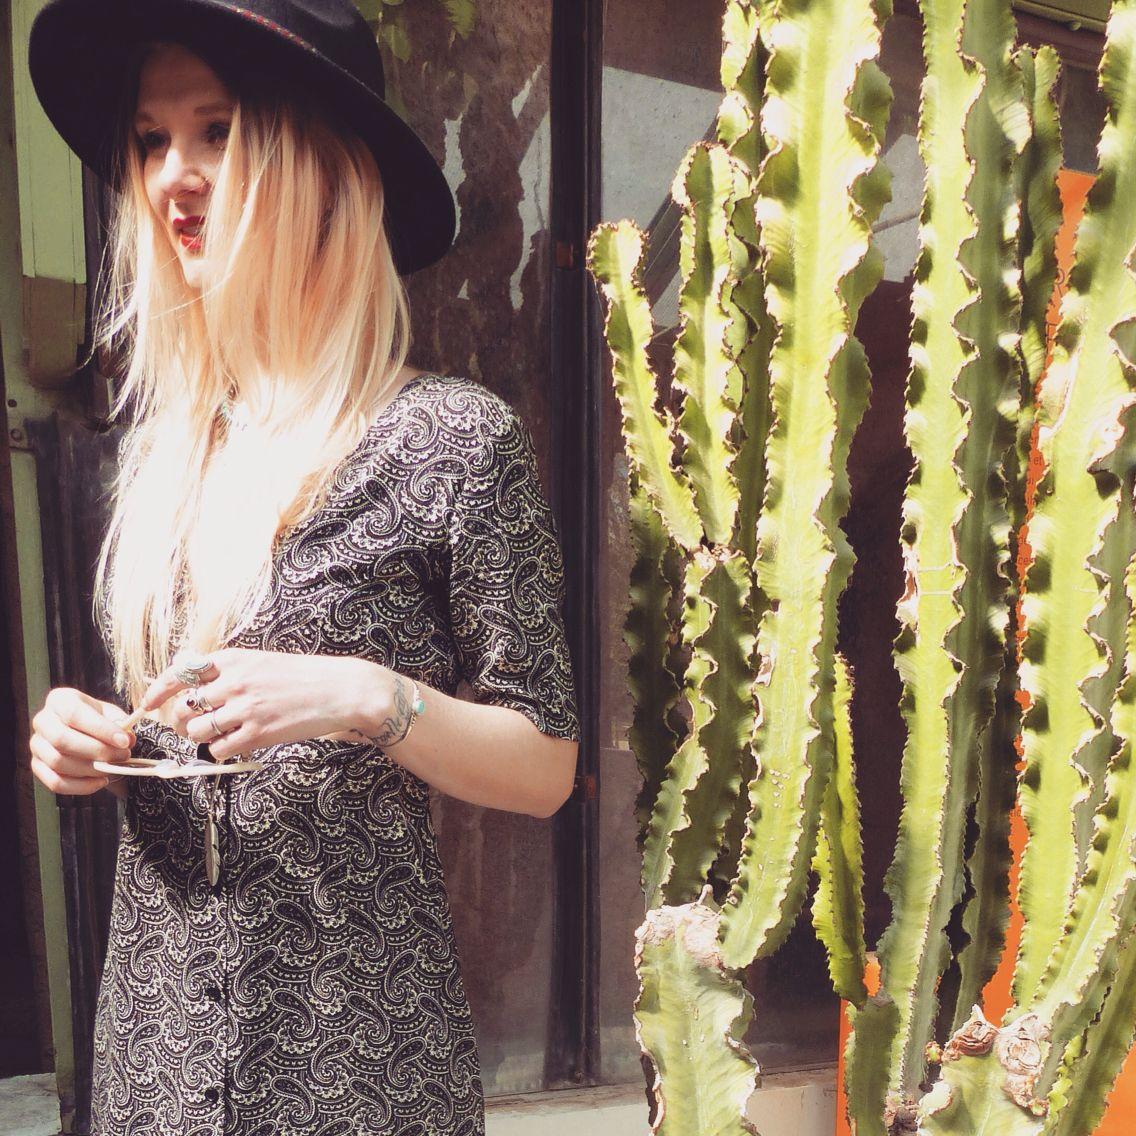 #cactus #cactuslover #plantlover #boho #boheme #wild #wildandfree #paris #blondgirl #asos #bohogirl #mode #style #look  #arizonadream #jardindesplantes #hat